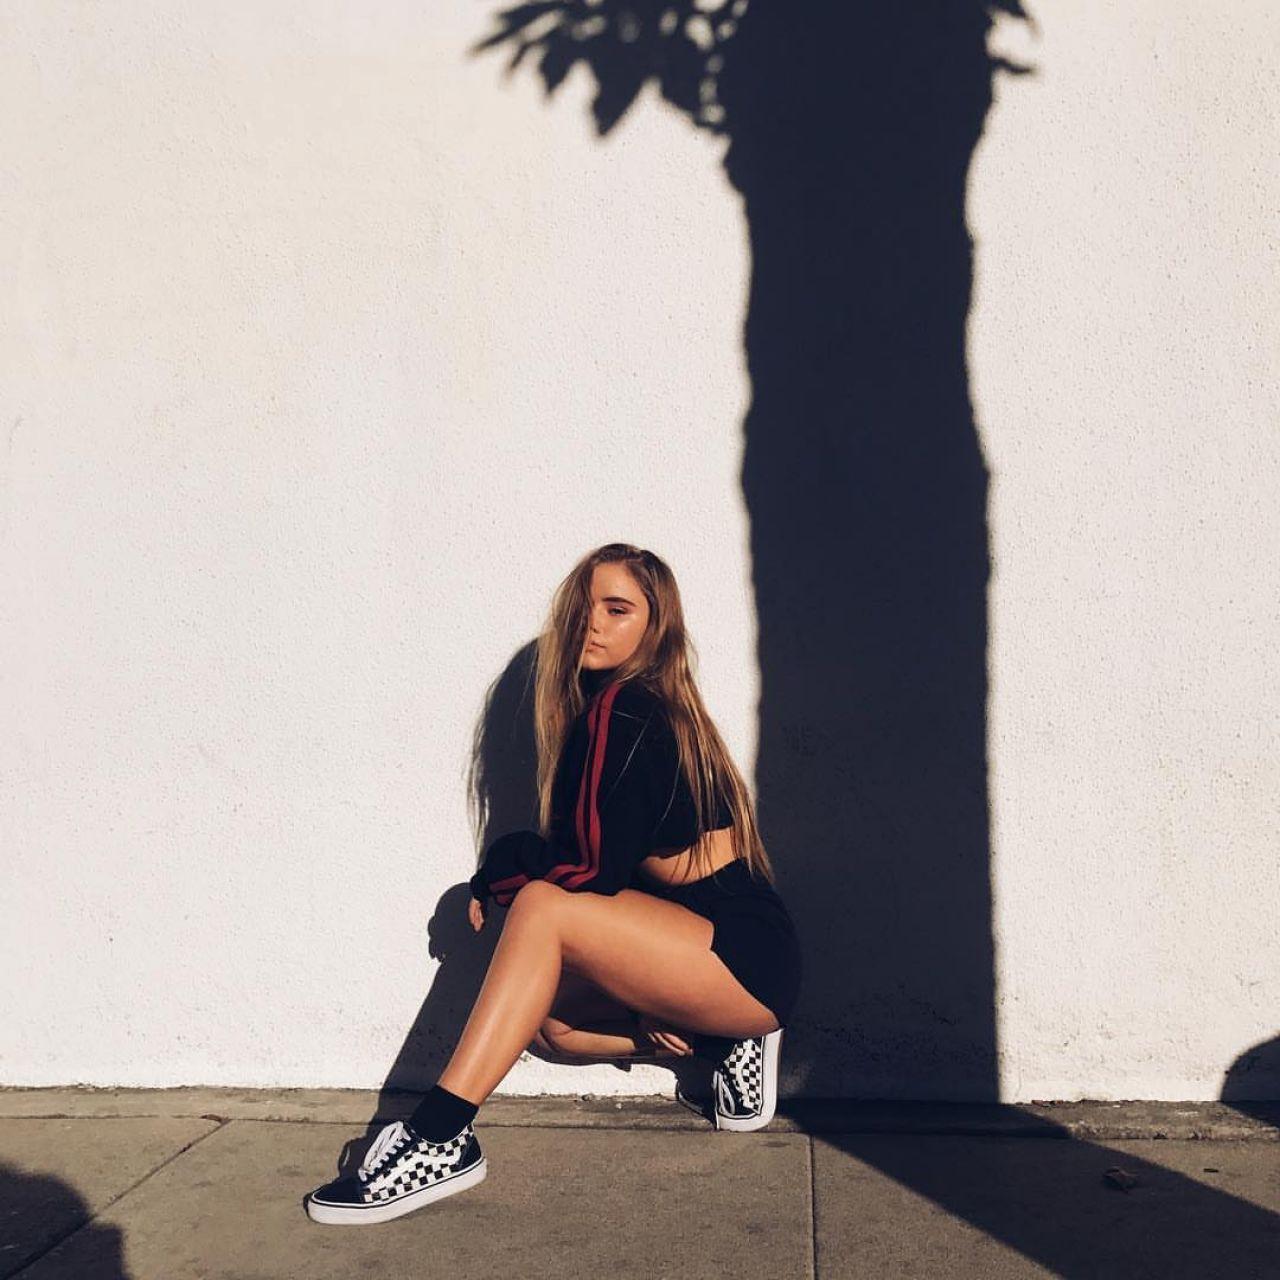 Lexee Smith Pics and Videos – Social Media